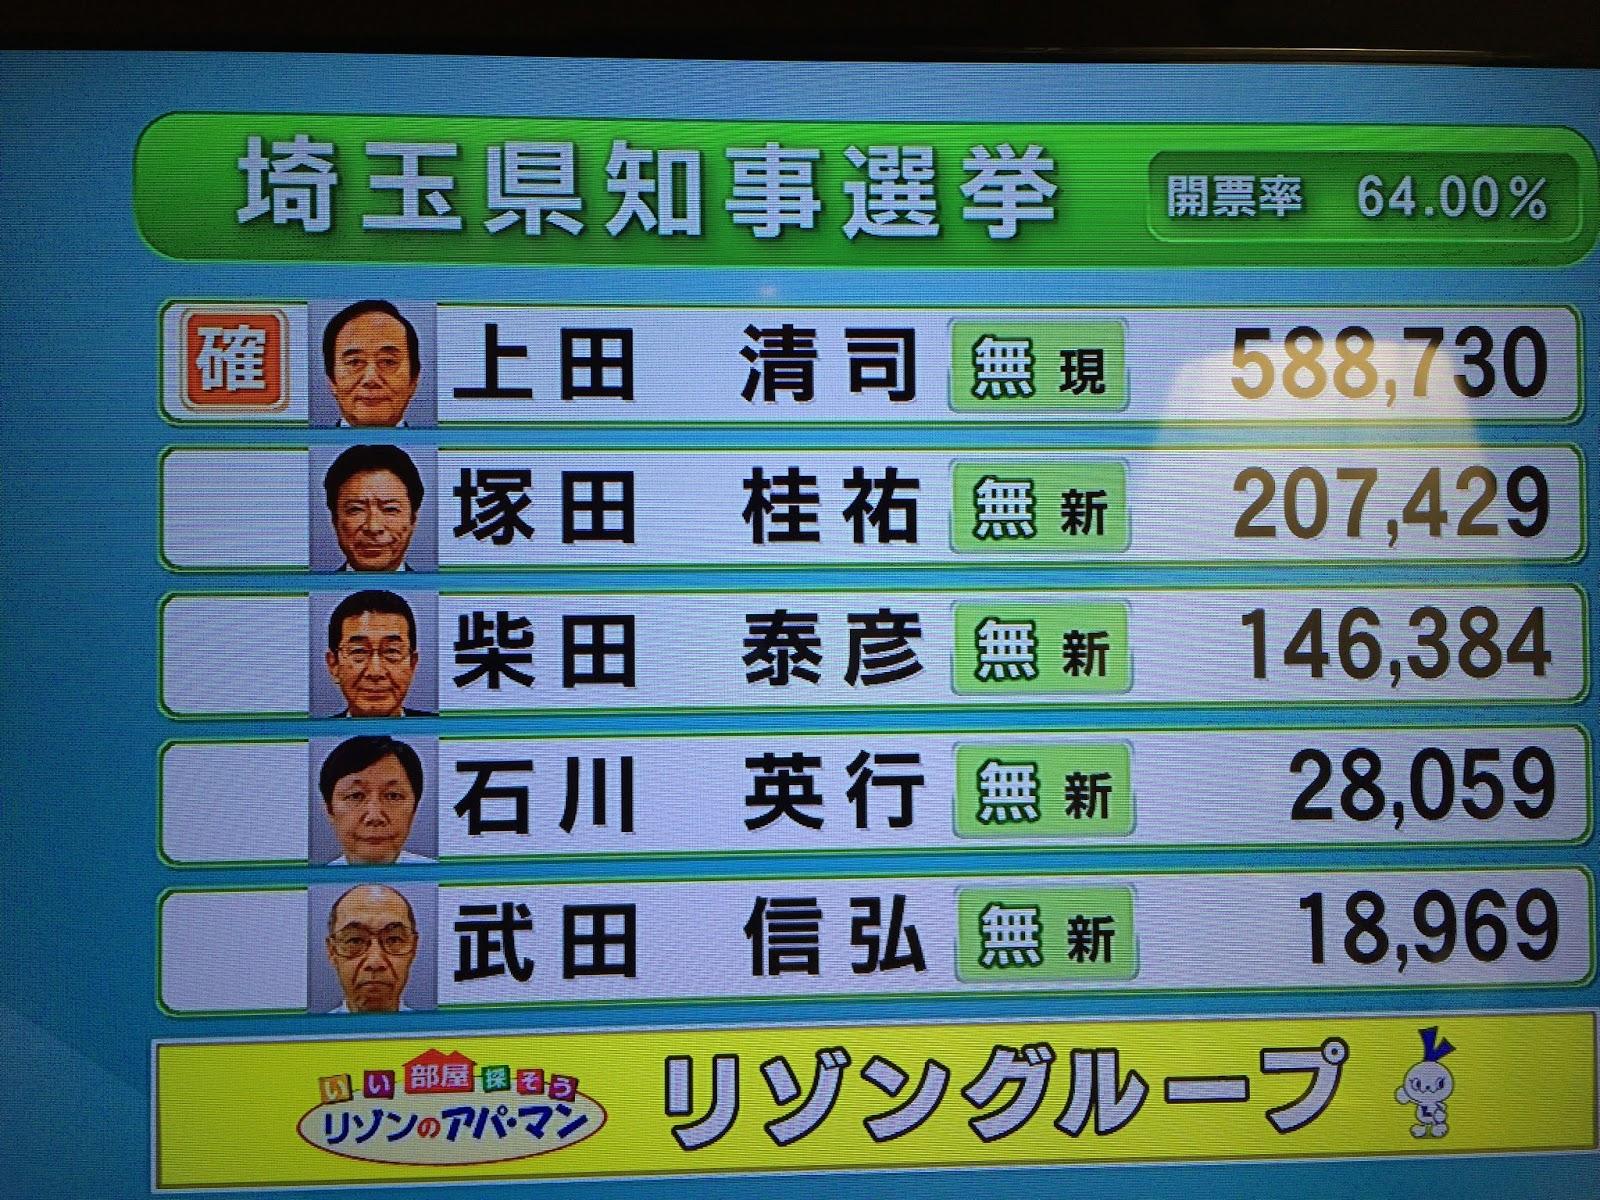 【埼玉県知事選挙 出口調査】上田清司当選確実(テレビ埼玉)投票率26・63%(+1・74)  - 選挙ジョッキー